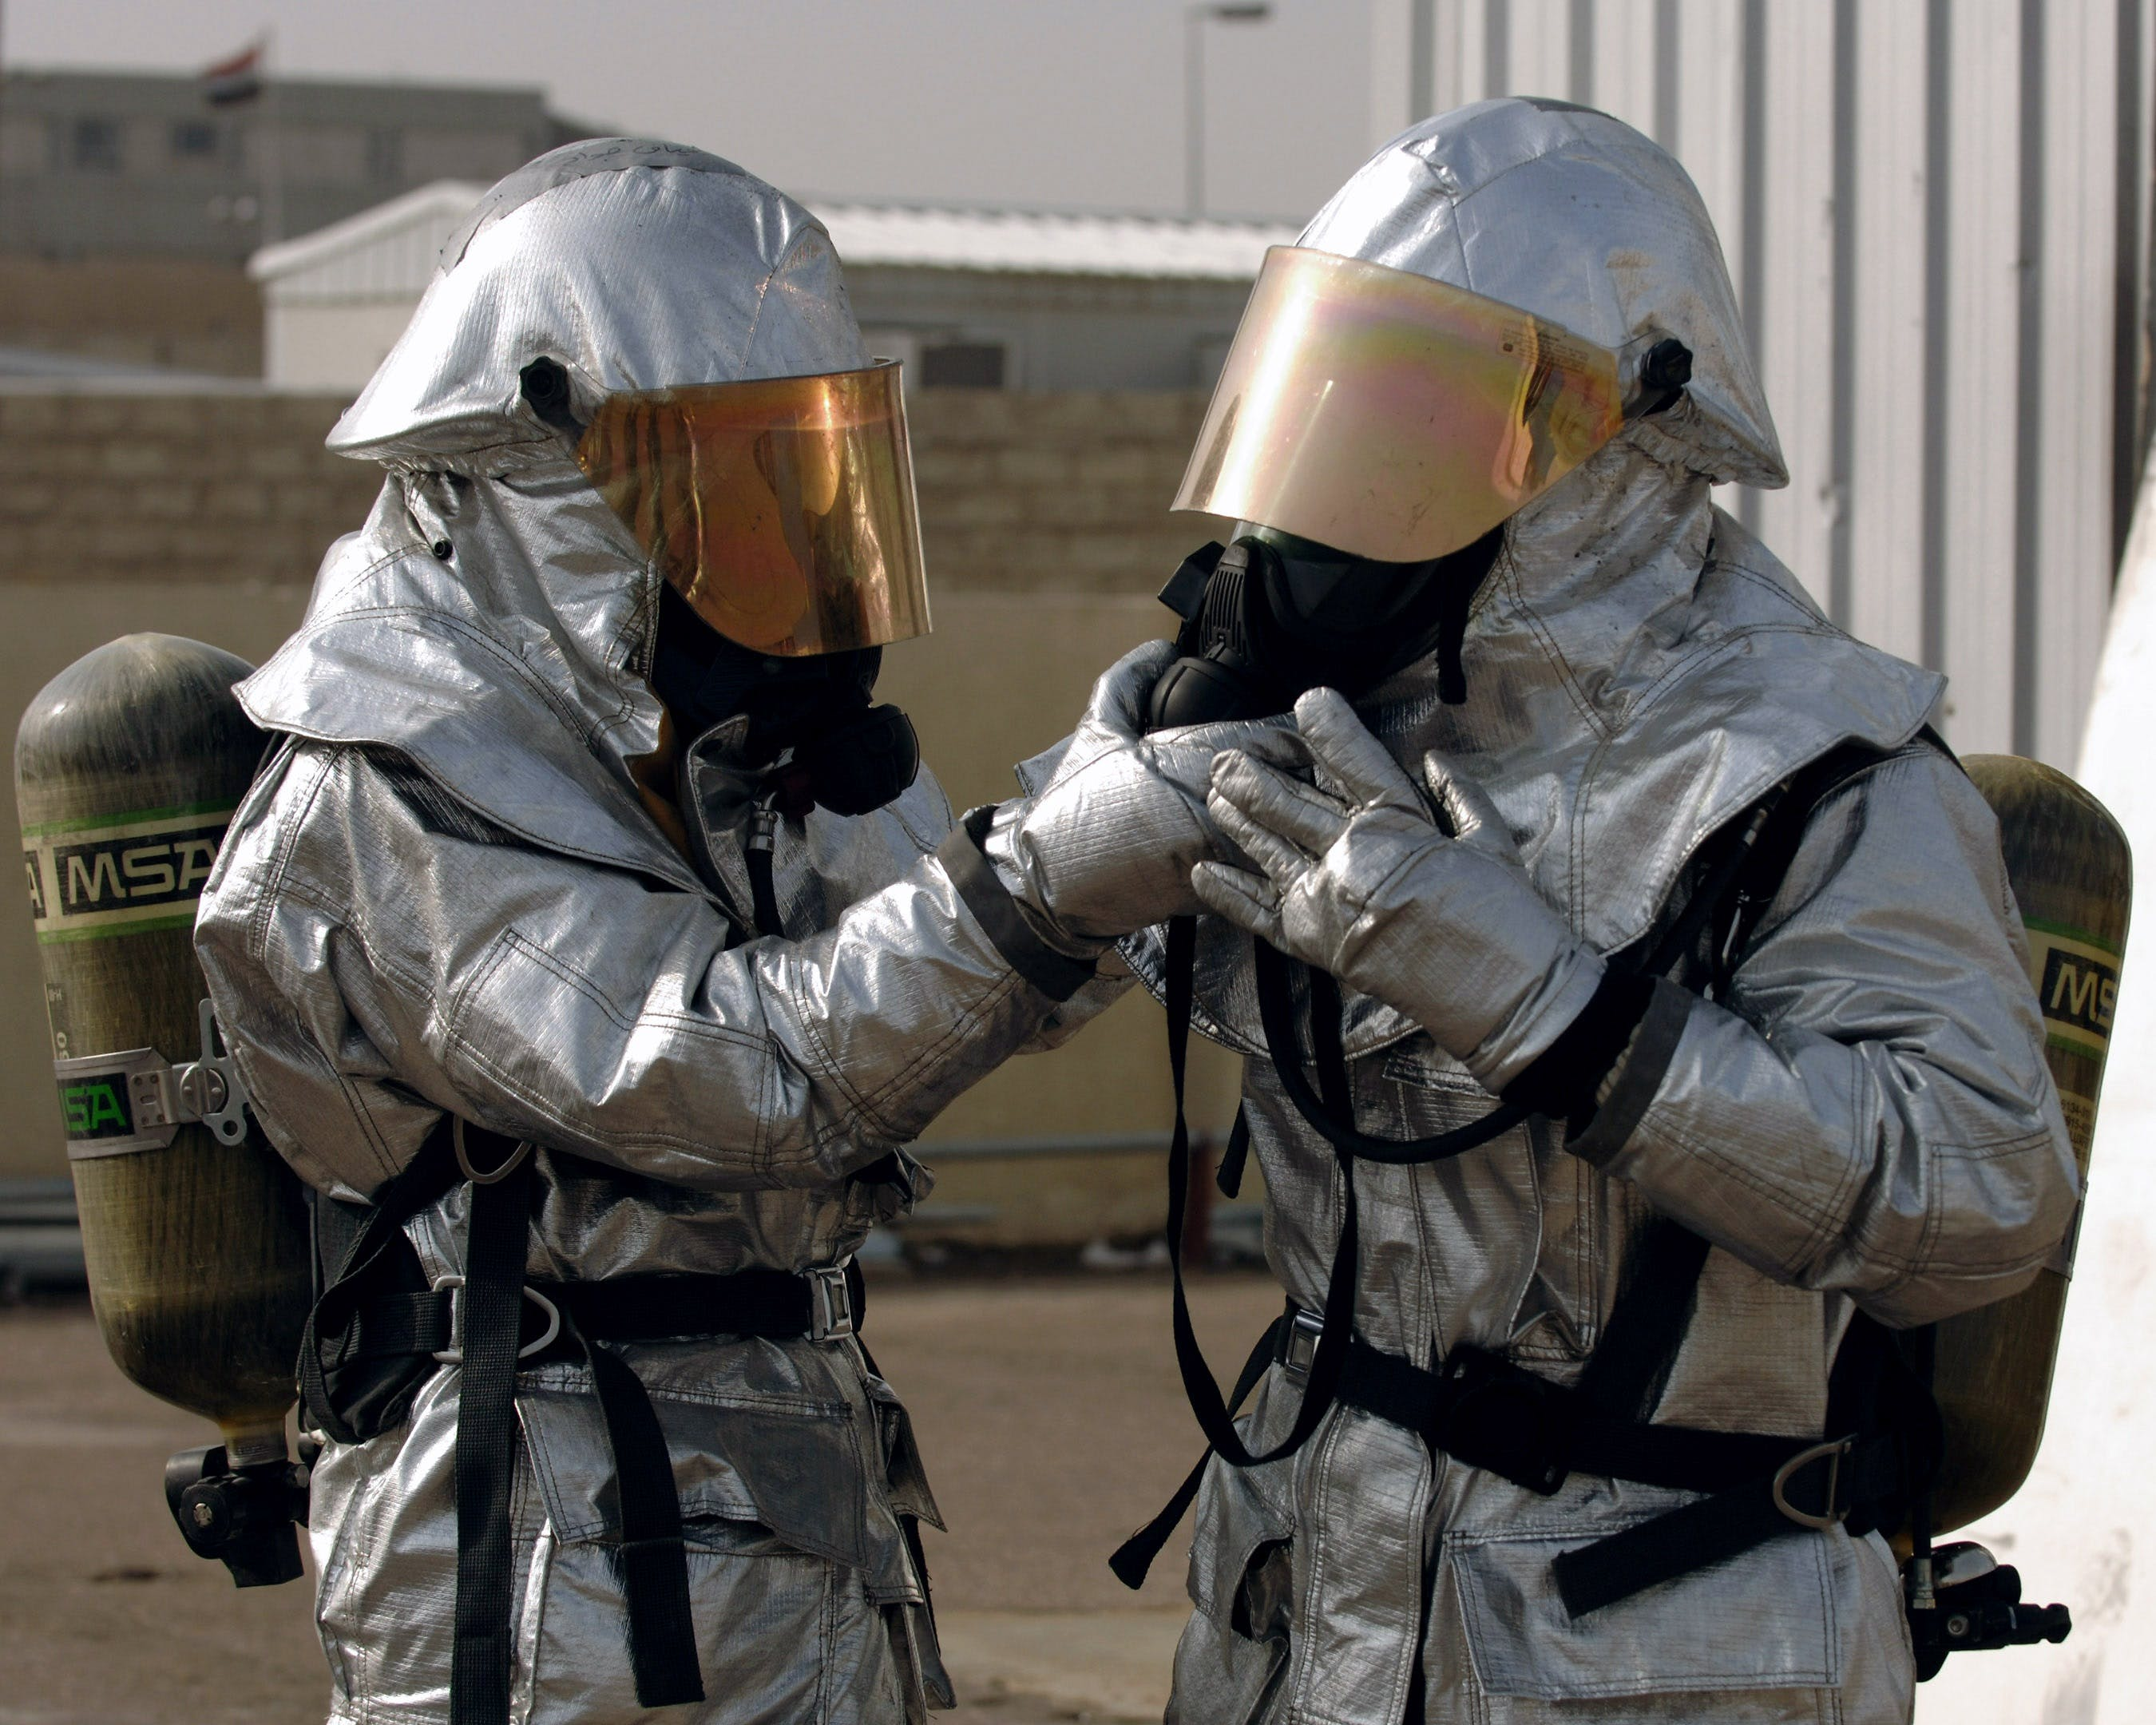 ademhalingsapparatuur, beschermend, brandweerlieden